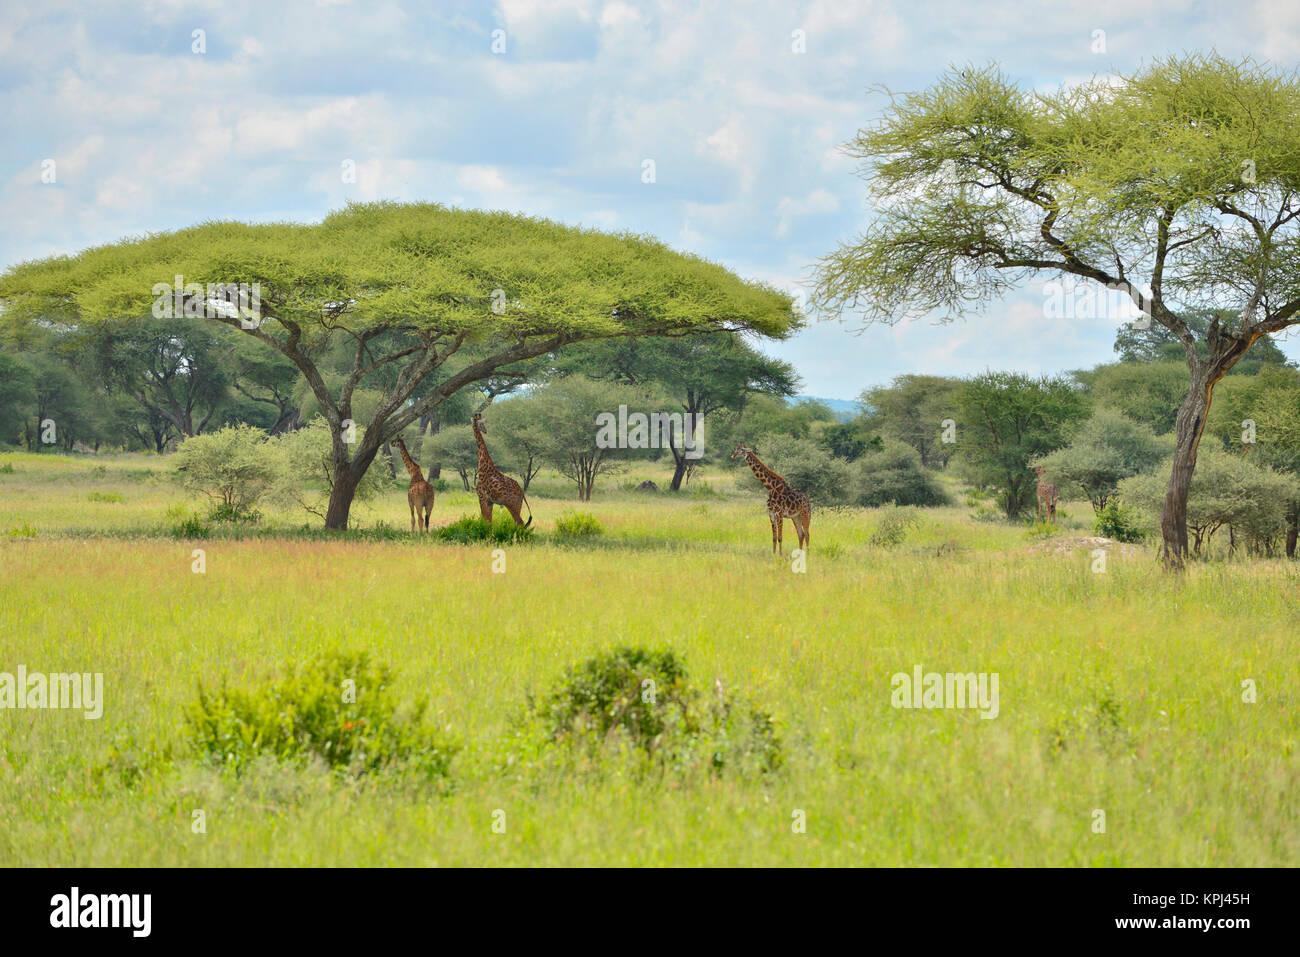 Girafe en vertu de l'acacia dans le parc national de Tarangire, en Tanzanie. Banque D'Images